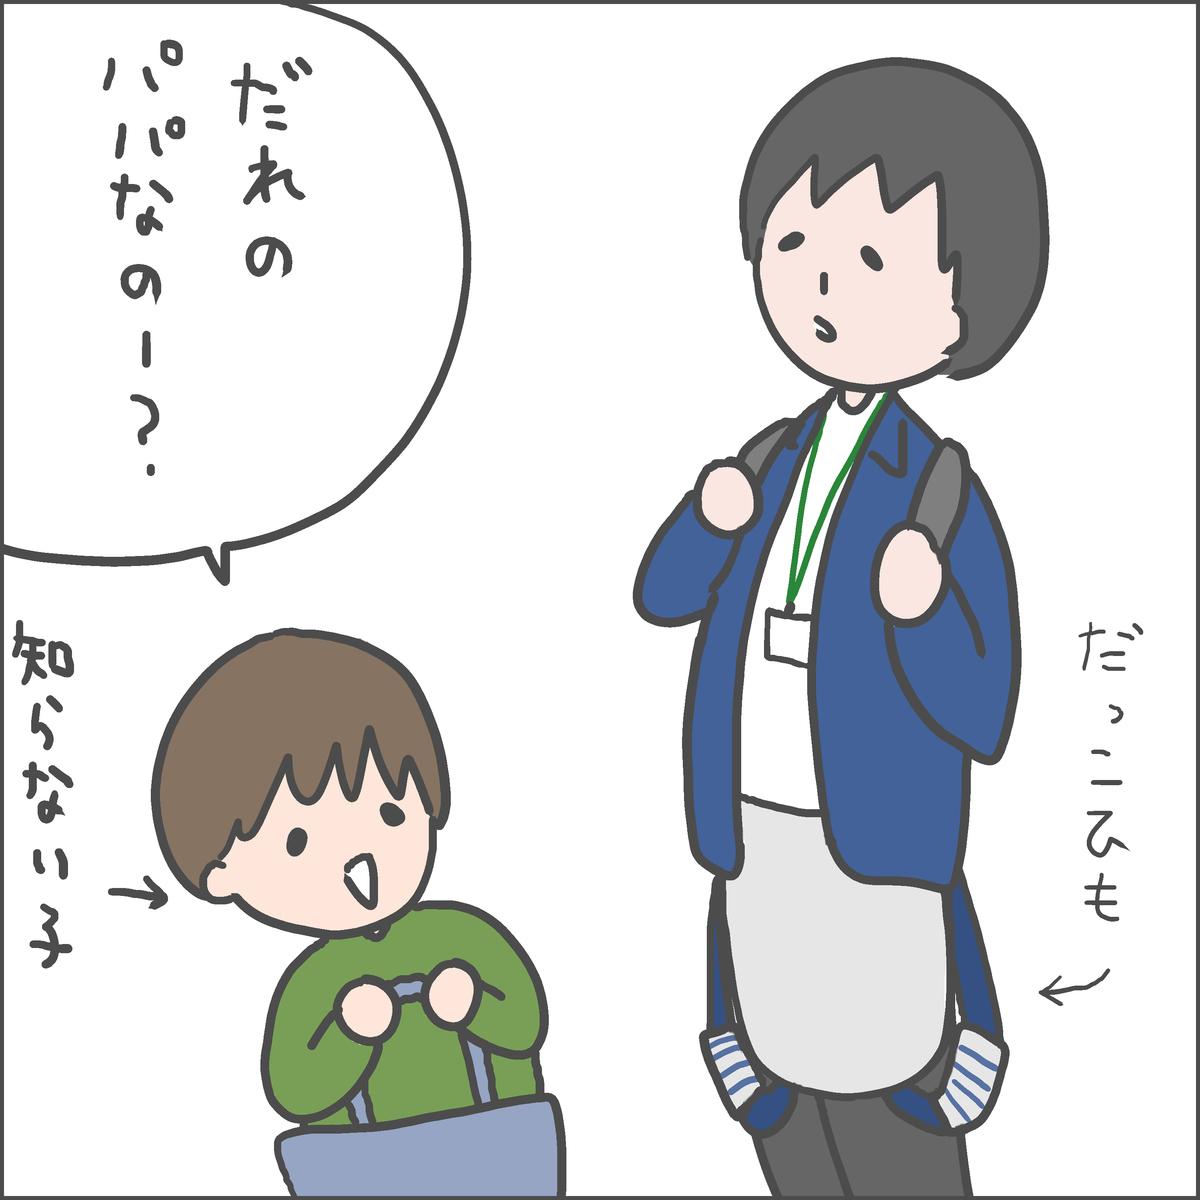 f:id:ika_yoshi:20210206035525j:plain